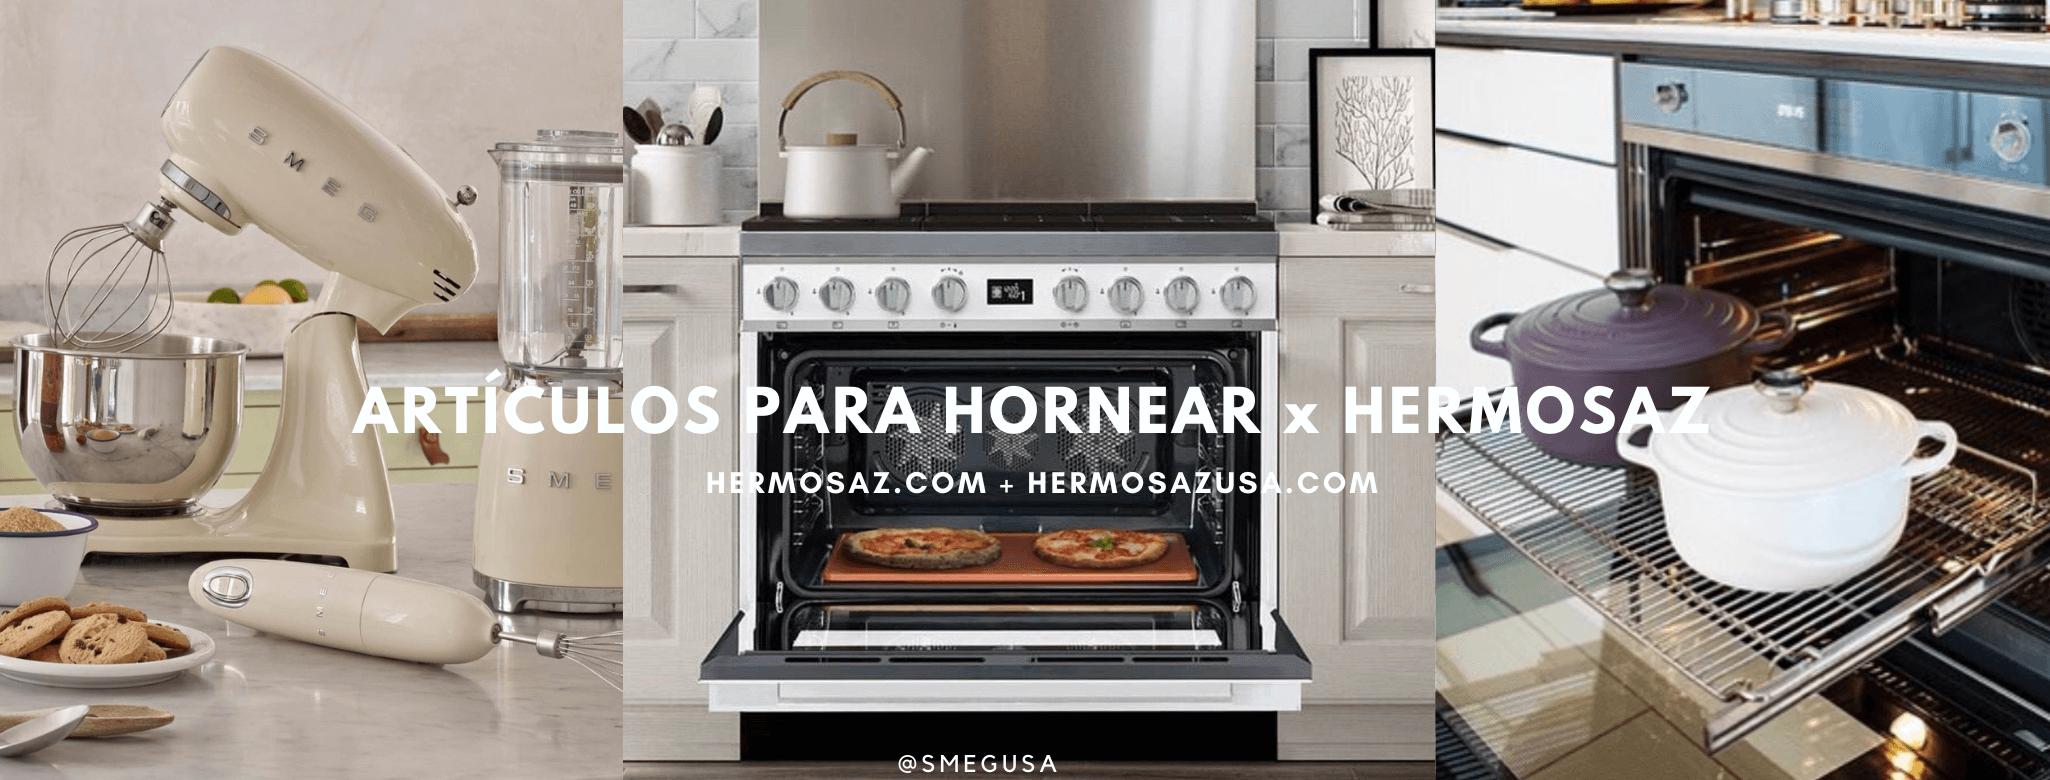 Bakeware x Heemosaz